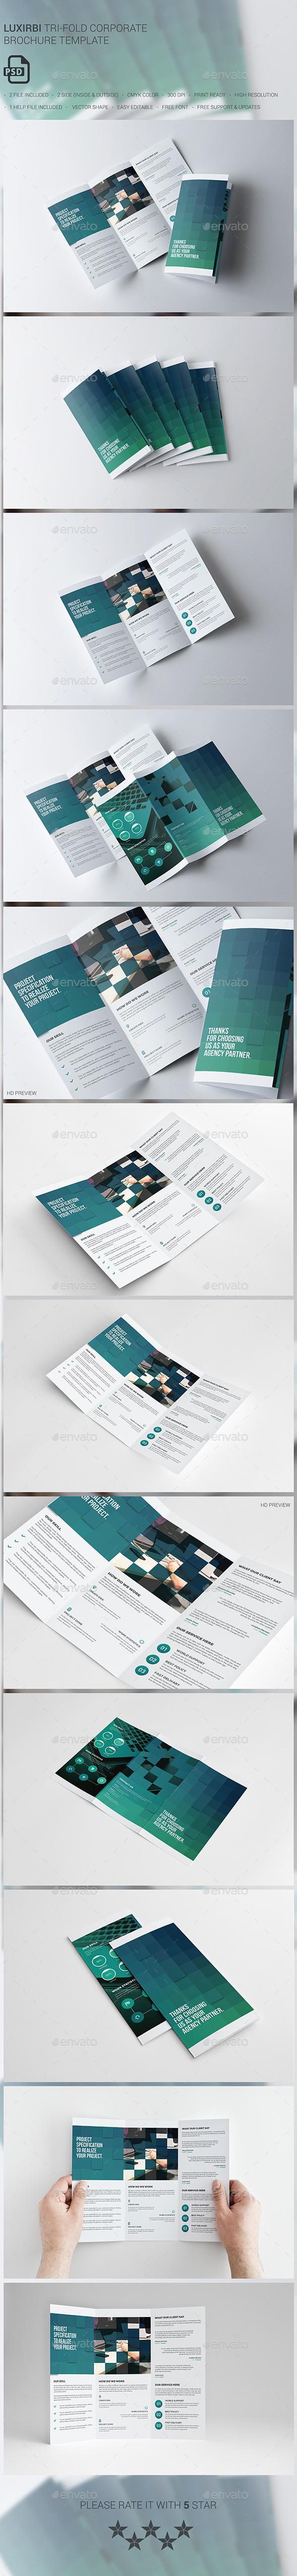 Luxirbi Corporate Tri-fold Brochure - Brochures Print Templates